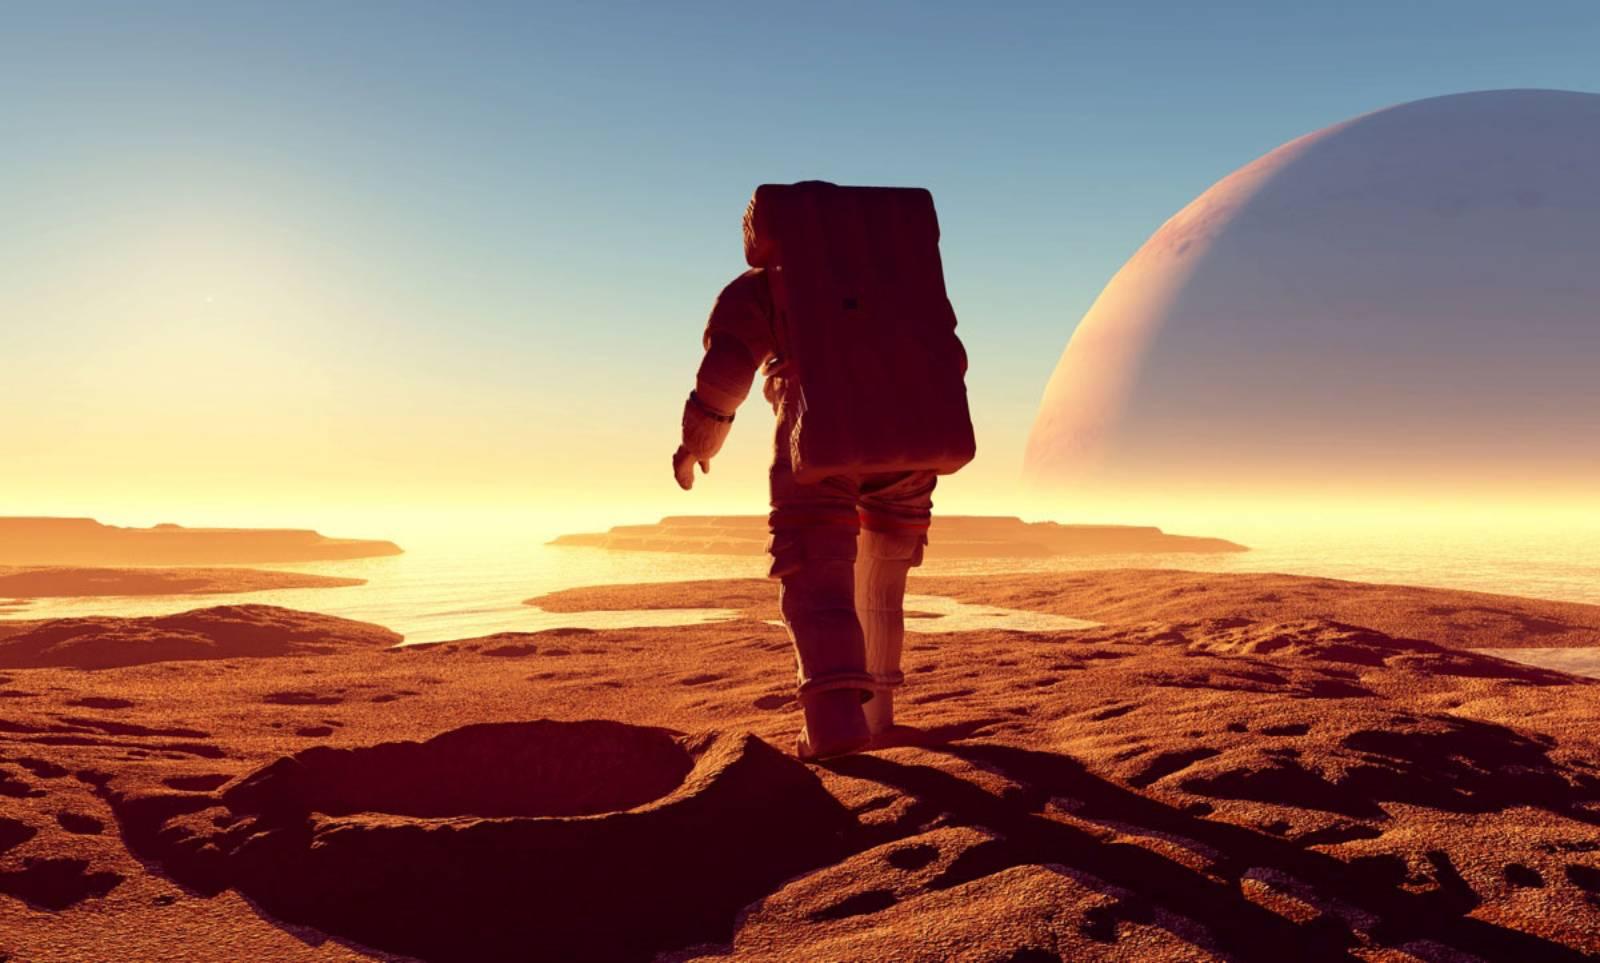 Planeta Marte Airbus NASA robot